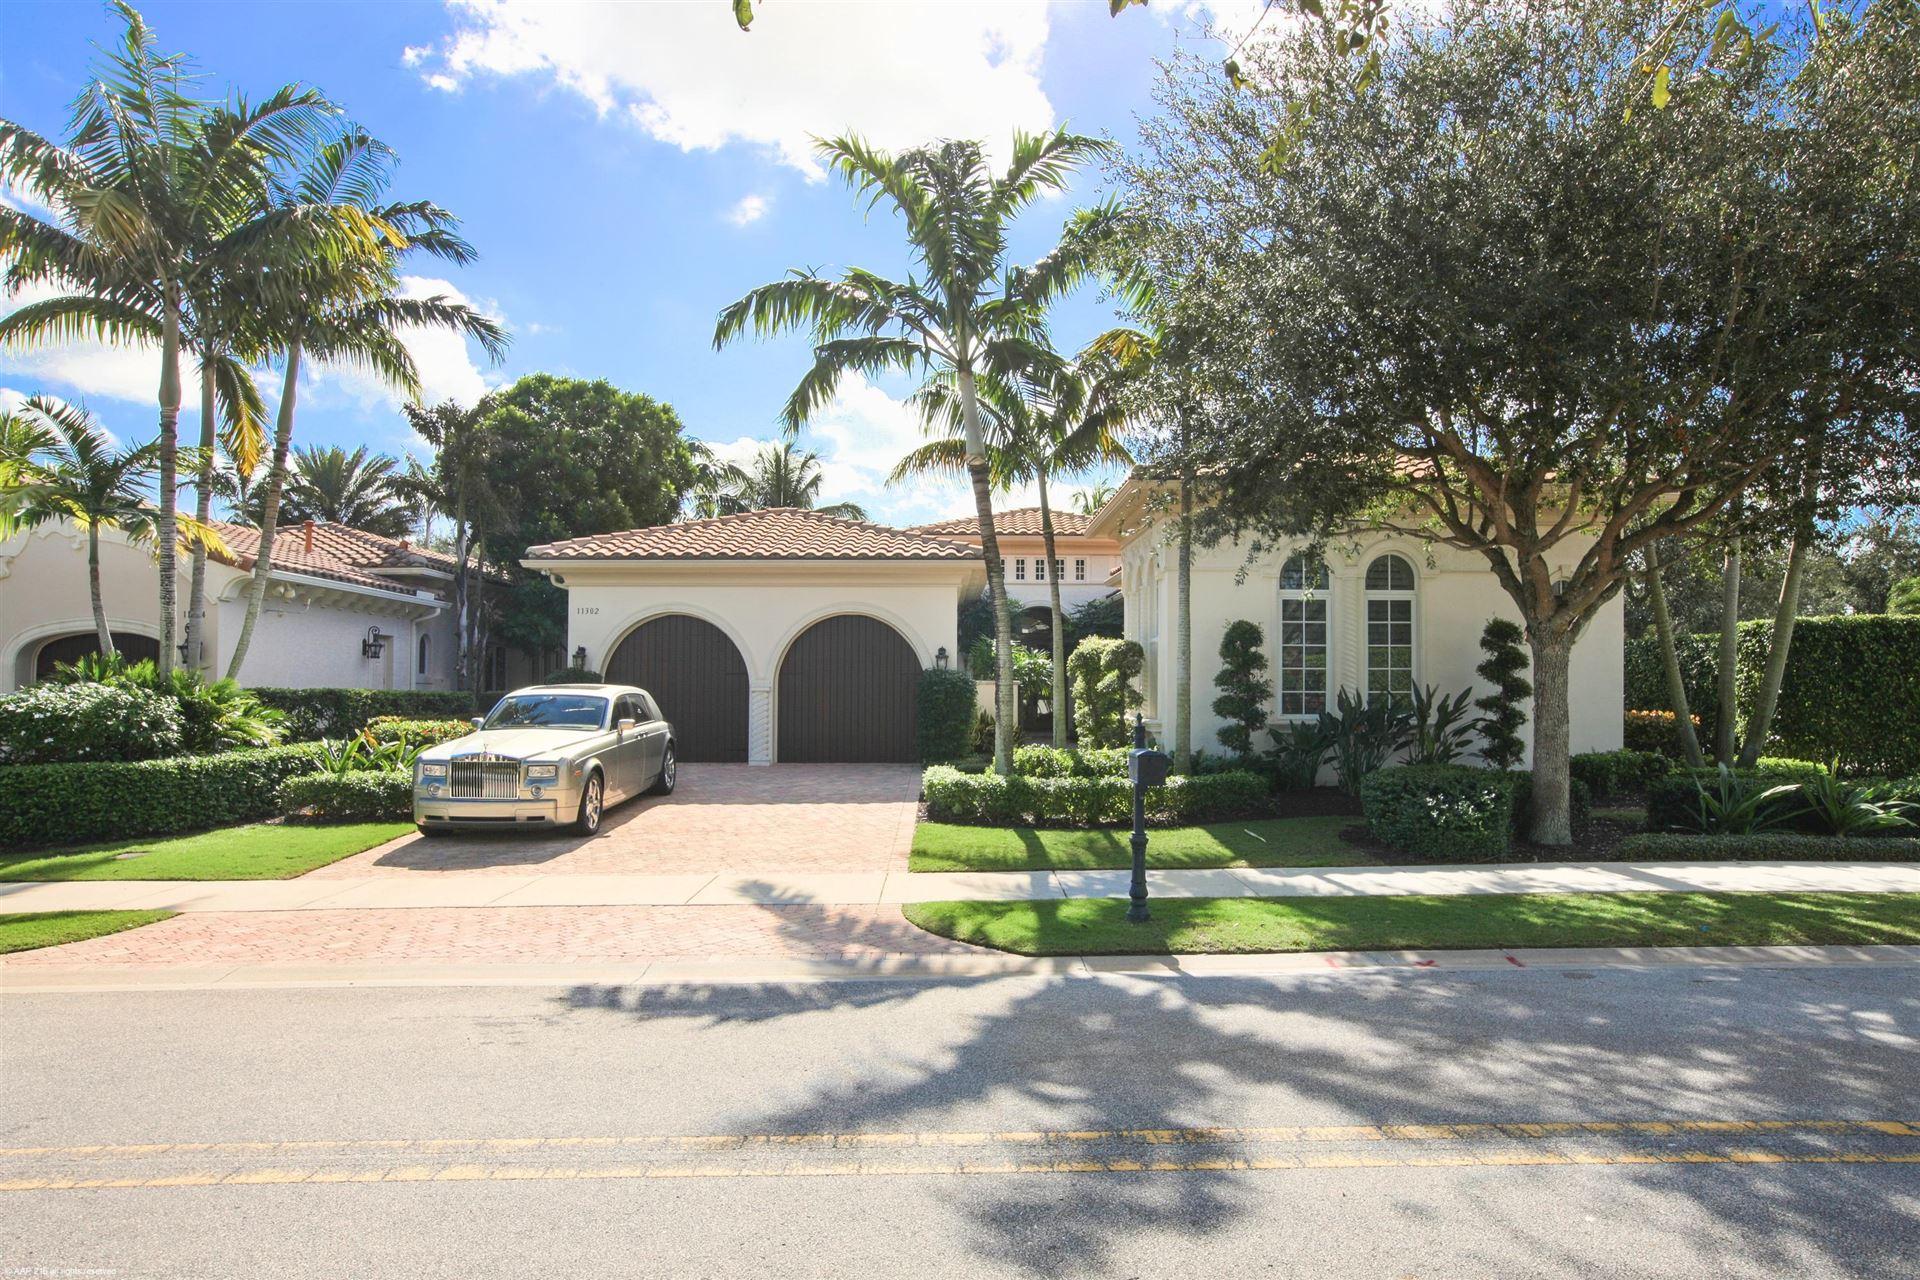 Photo of 11302 Caladium Lane, Palm Beach Gardens, FL 33418 (MLS # RX-10611732)